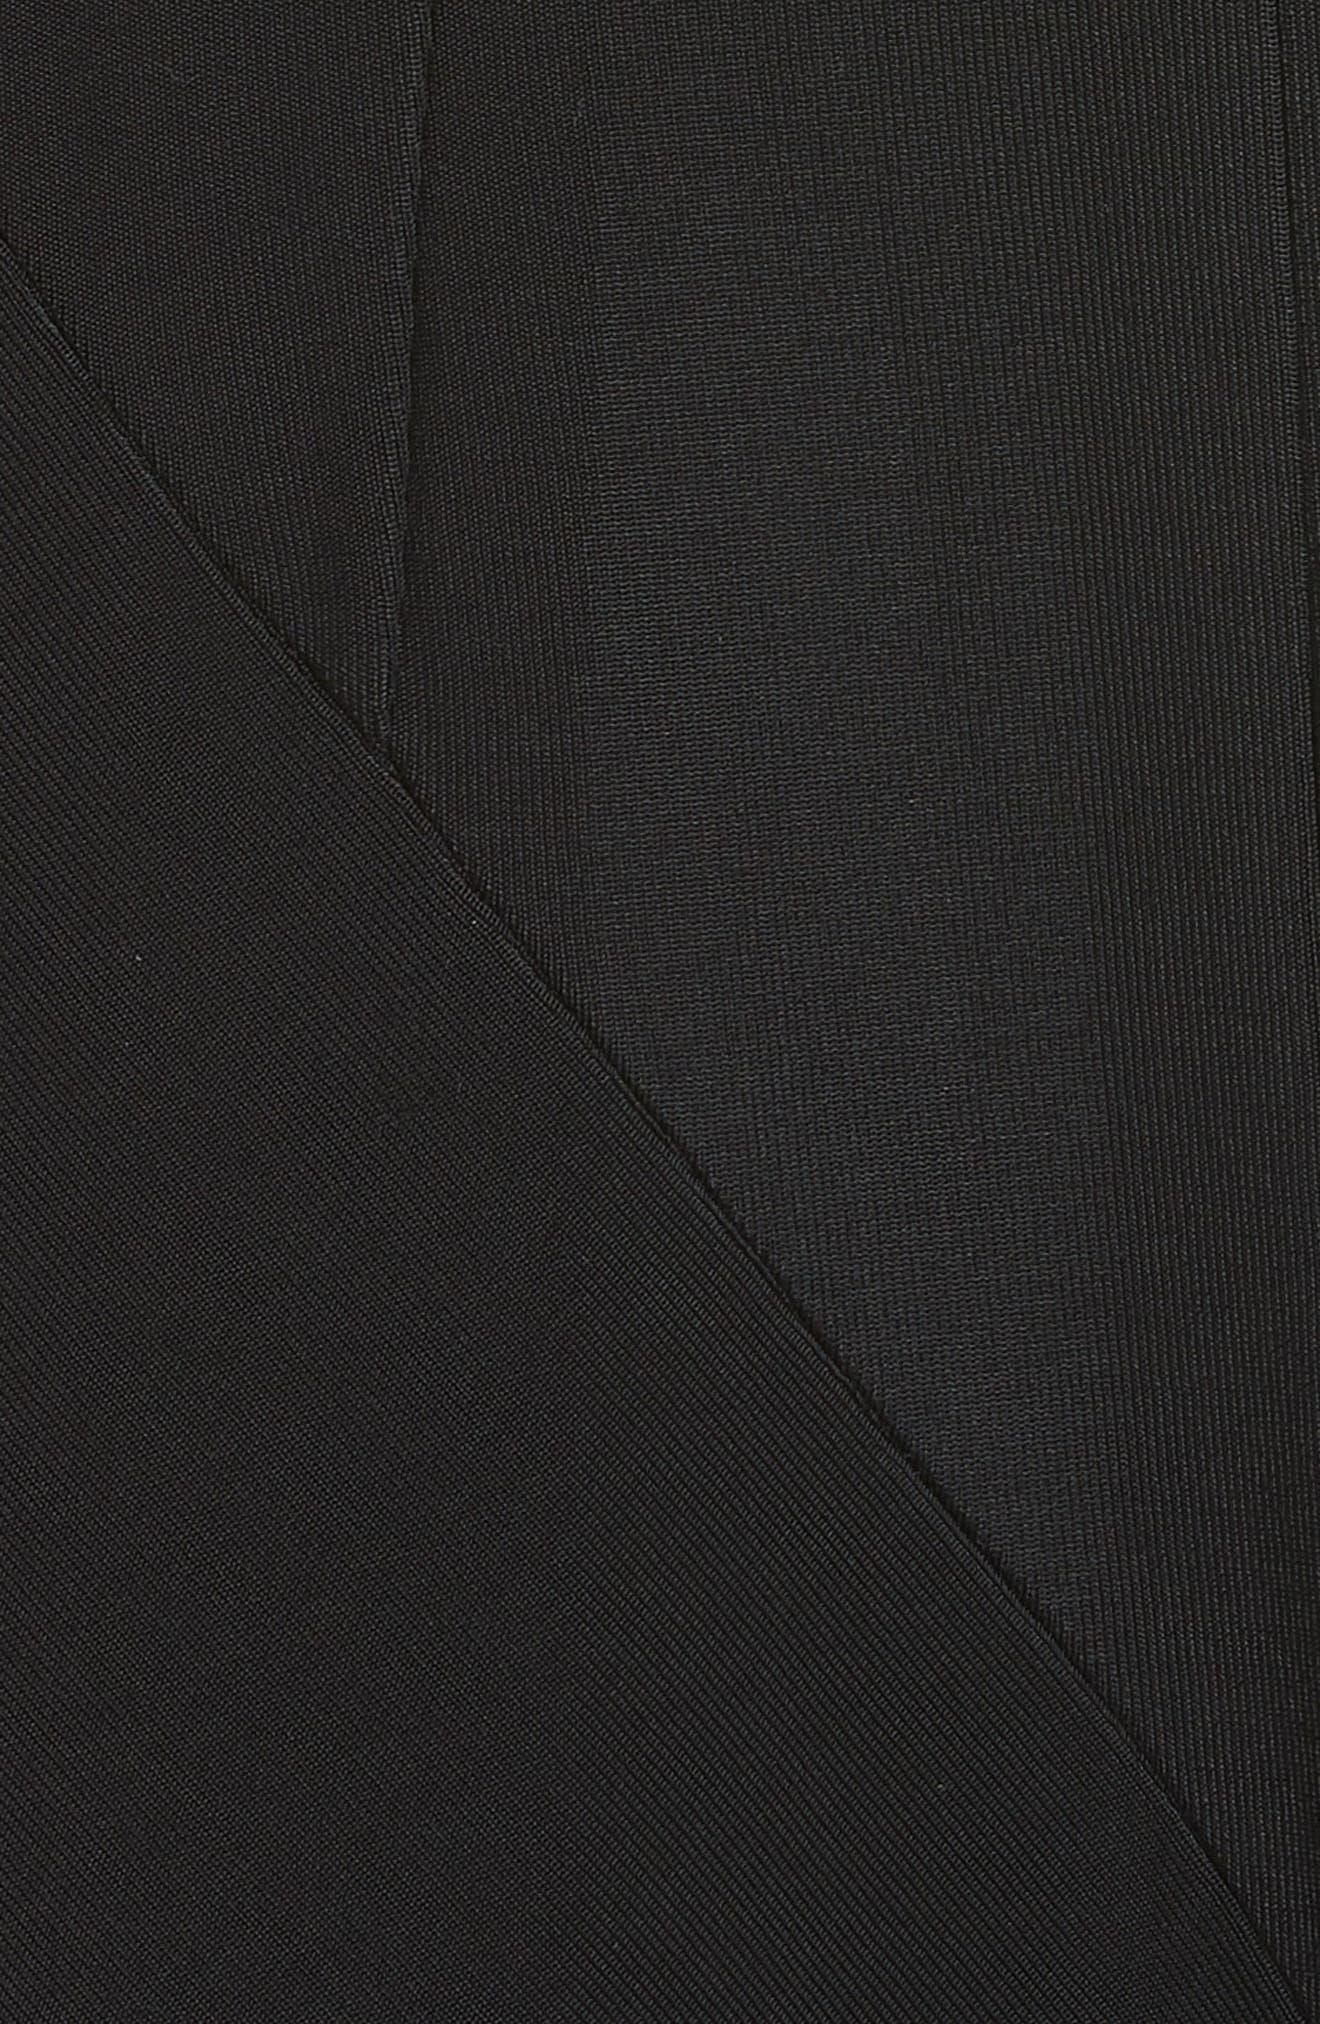 Colorblock Asymmetrical Gown,                             Alternate thumbnail 5, color,                             001